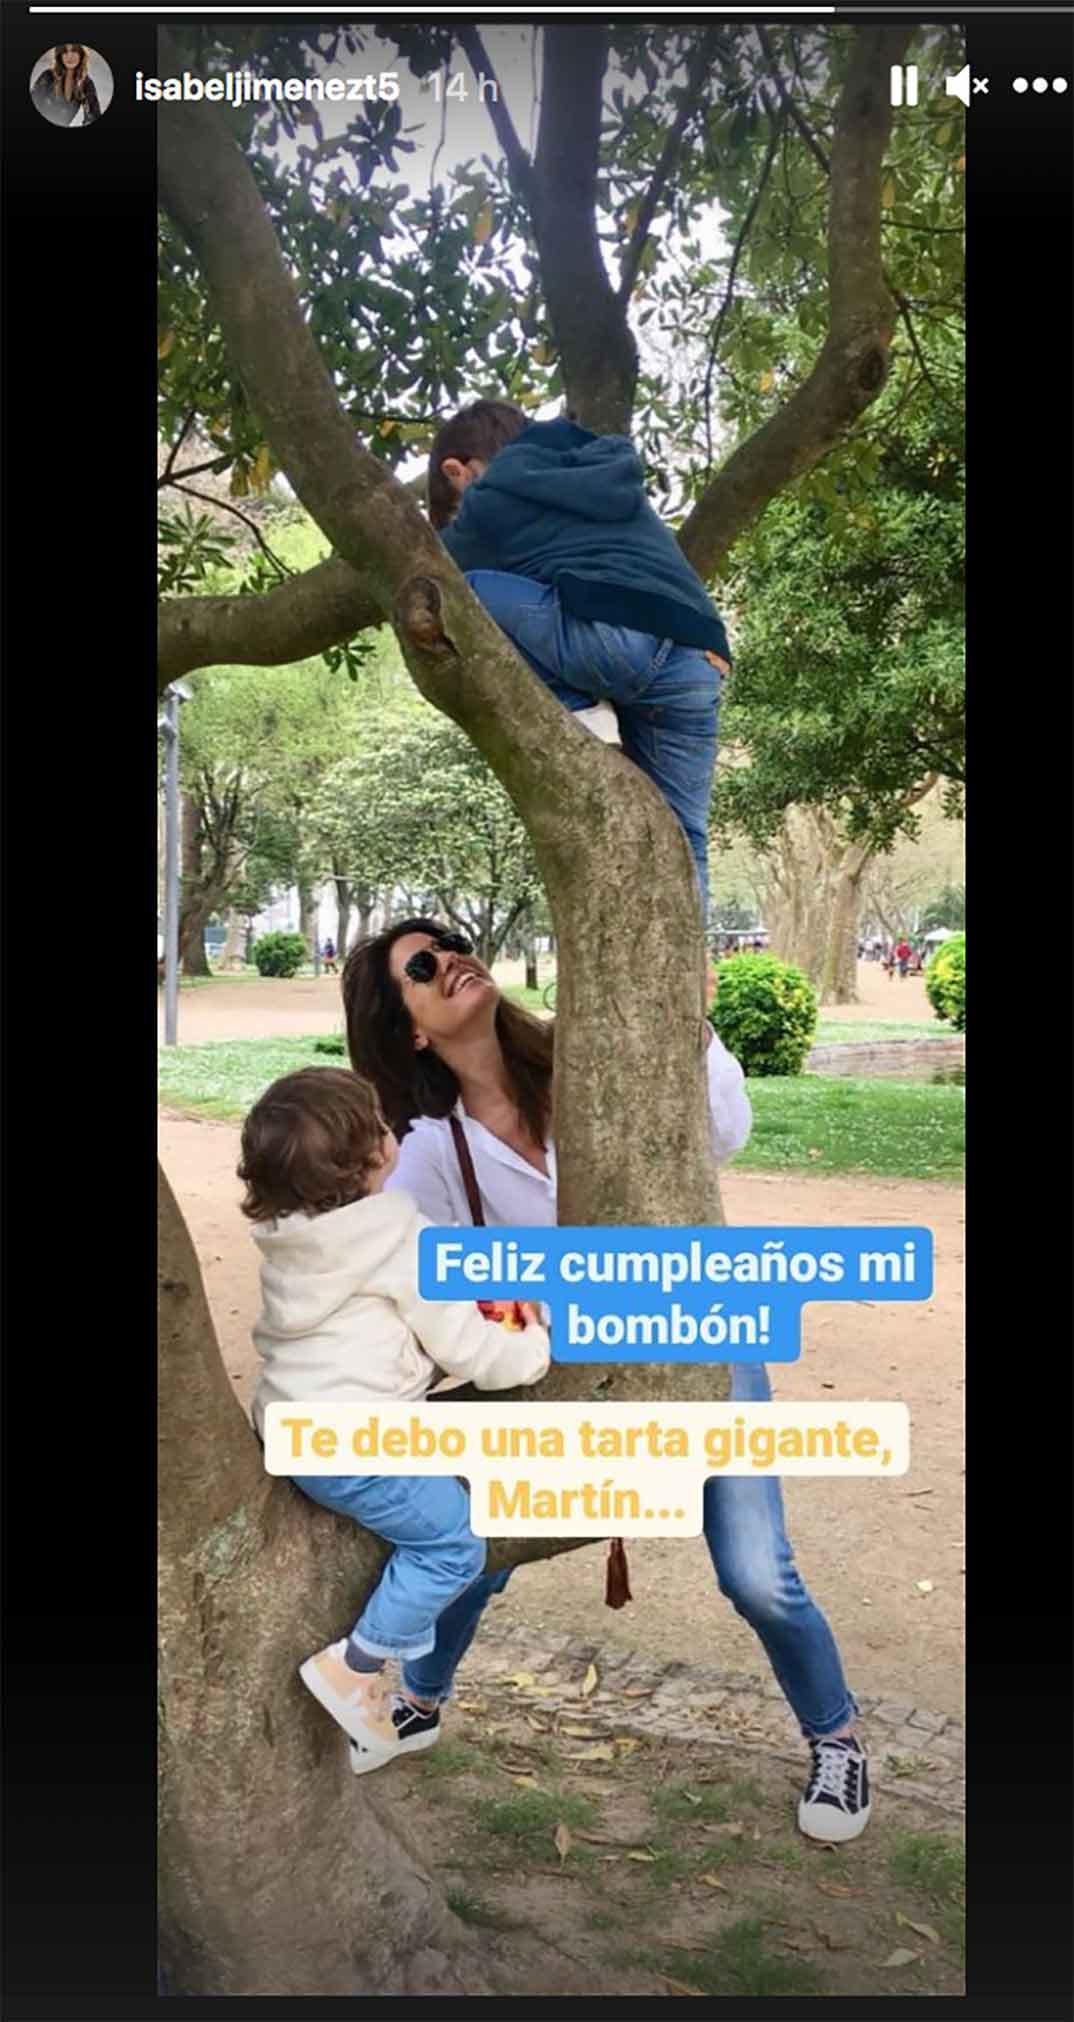 Isabel Jiménez © Instagram